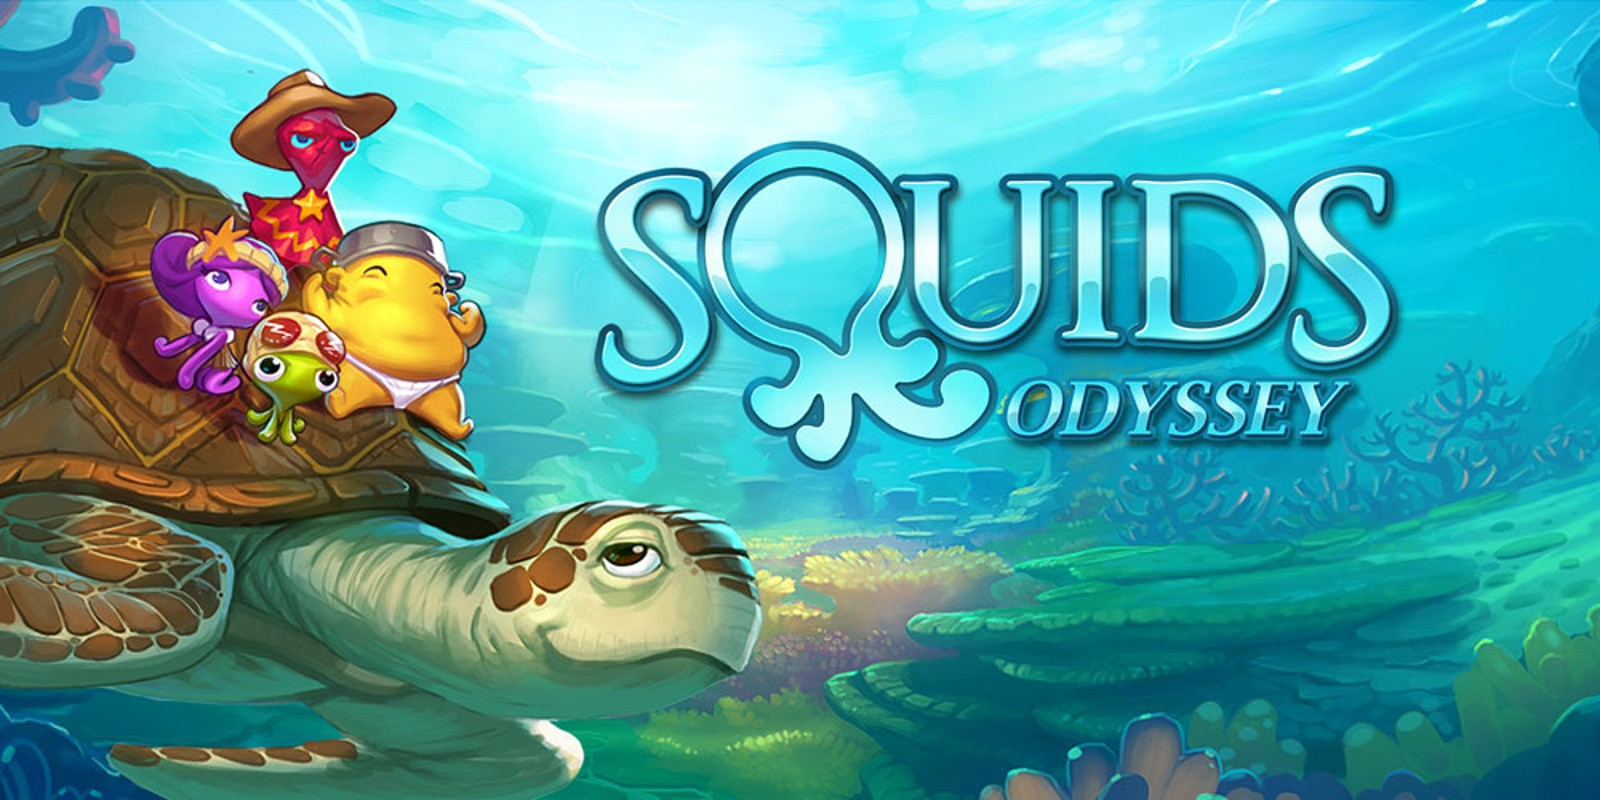 squids android